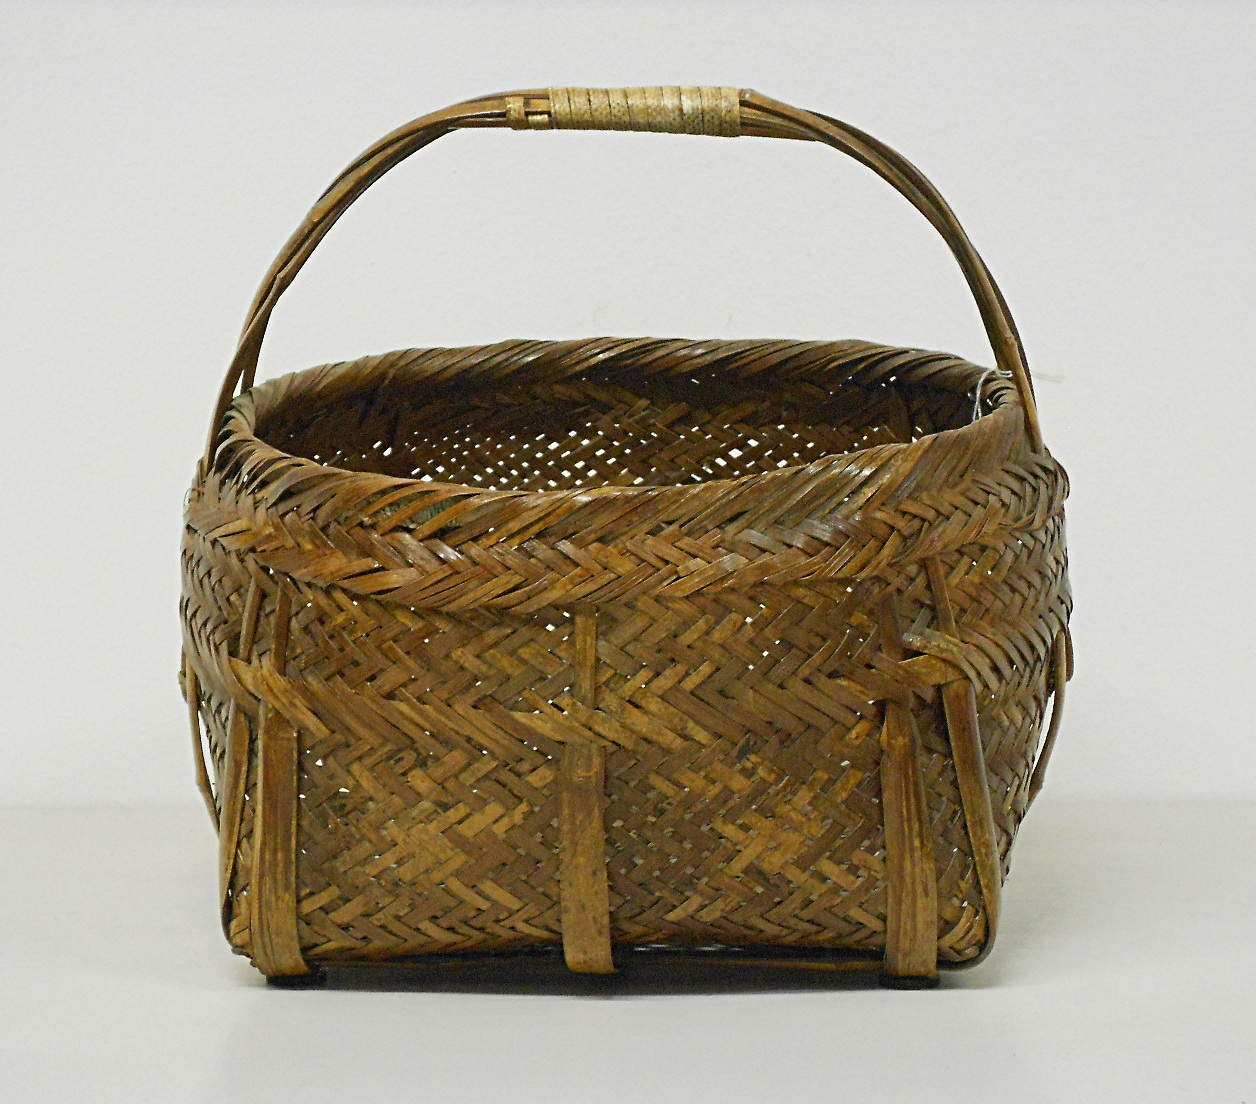 Cesta in rattan e bamb vendita online damodara for Vendita bambu